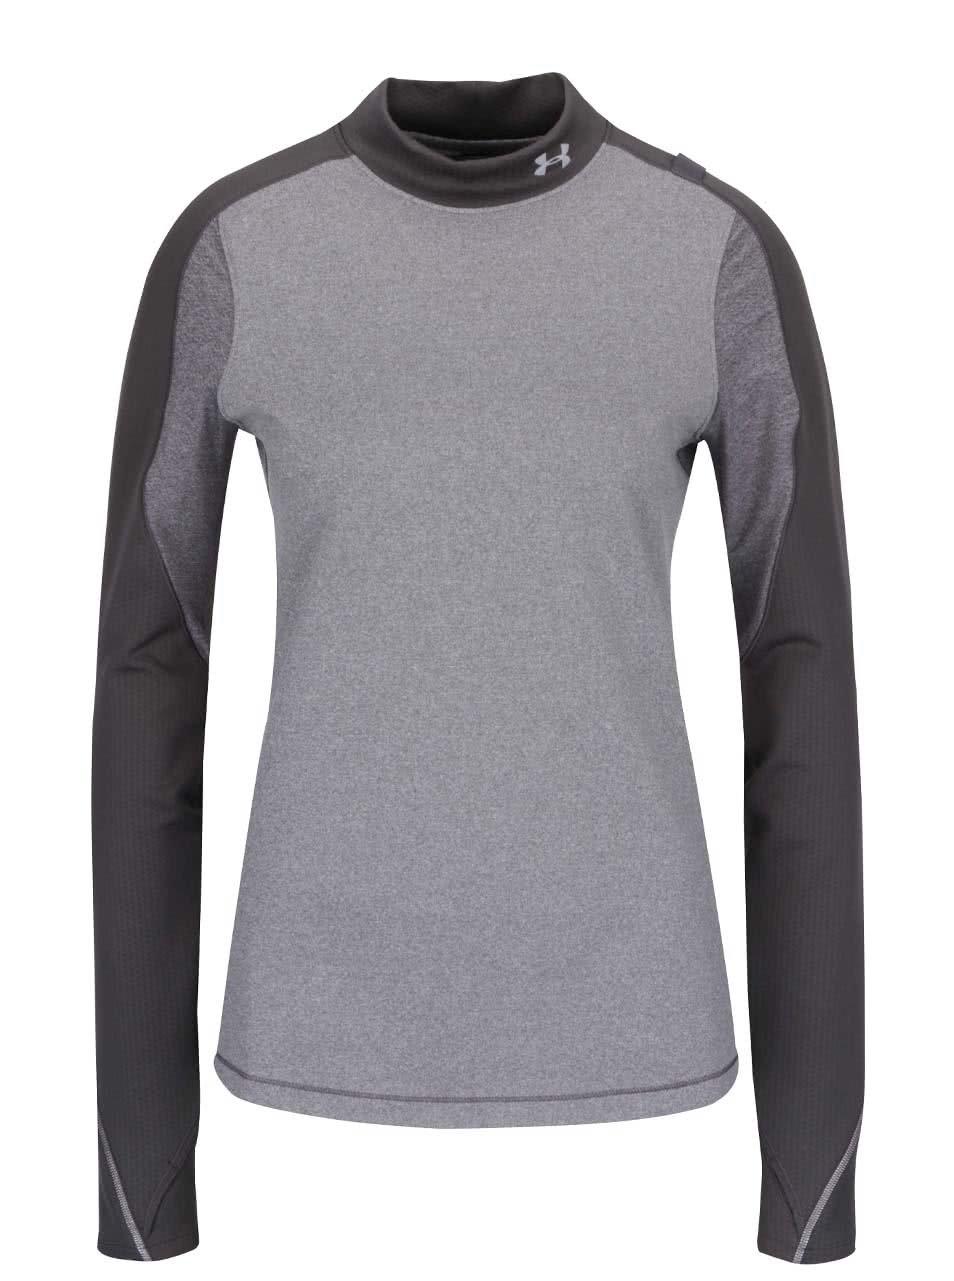 Sivé dámske funkčné tričko s dlhým rukávom Under Armour ColdGear Armour  Elements Mock ... e2761984809